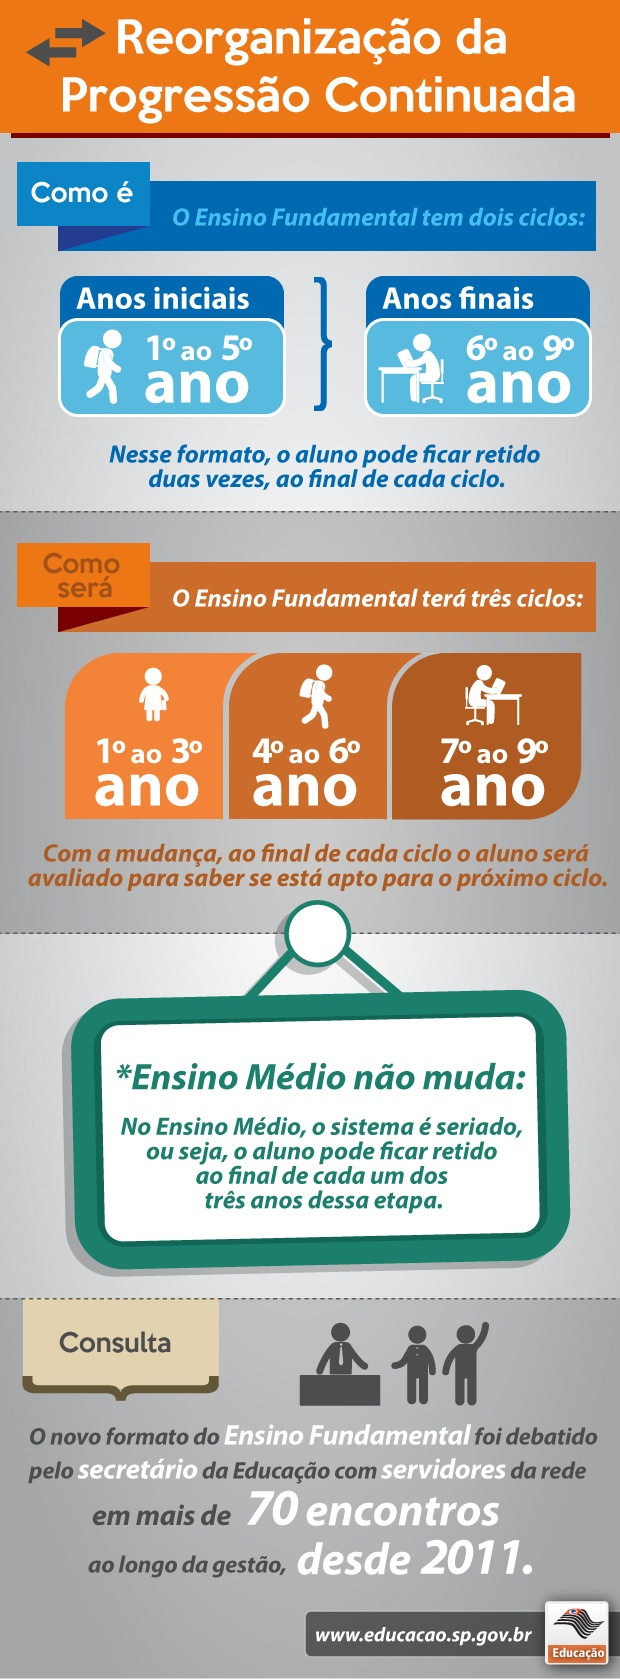 20131107_progressao_continuada_1679